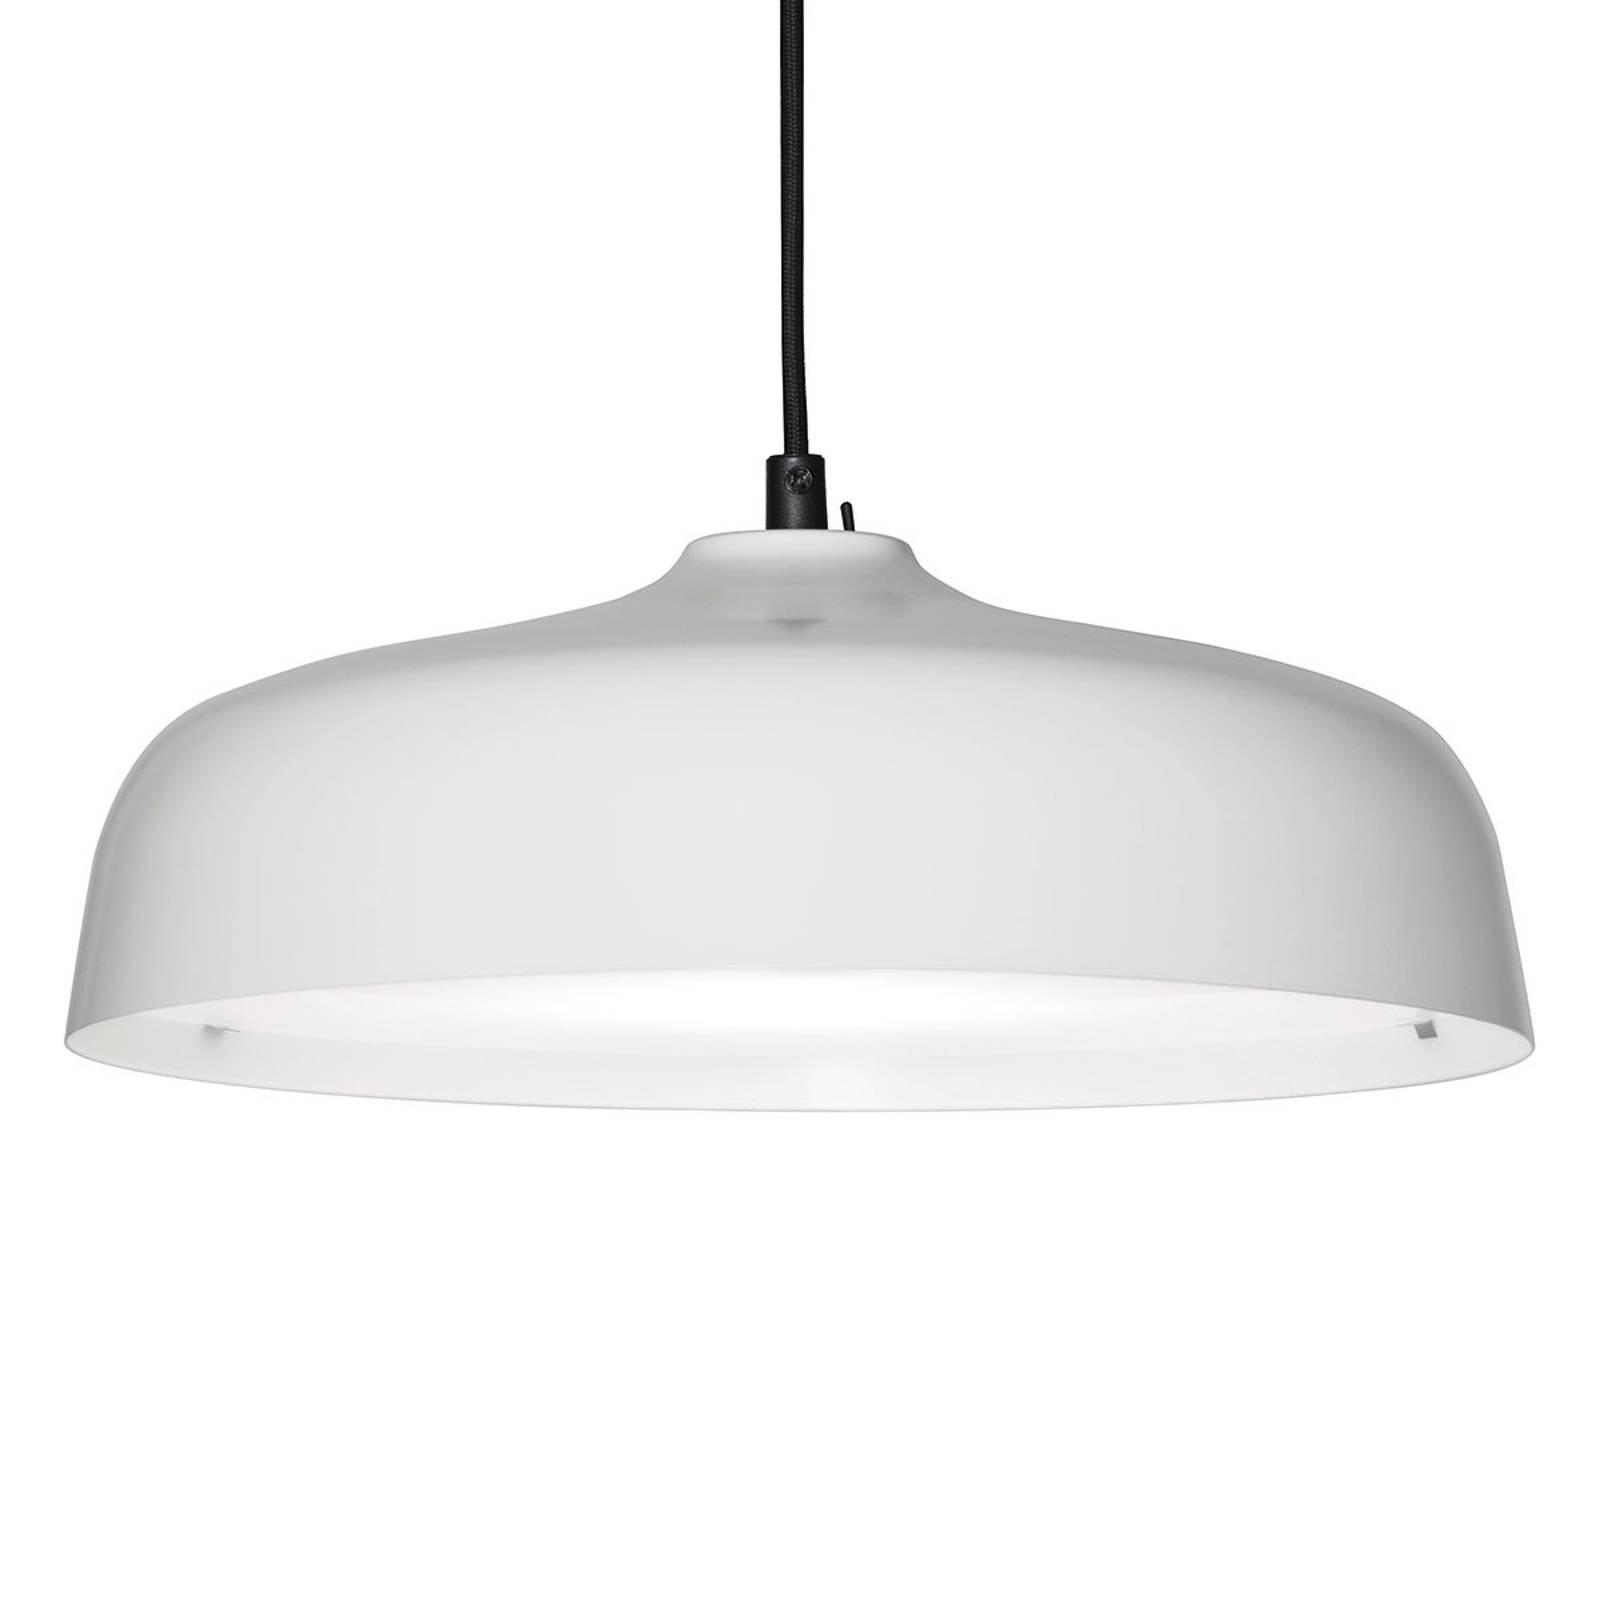 Innolux Candeo Air LED-hengelampe, hvit